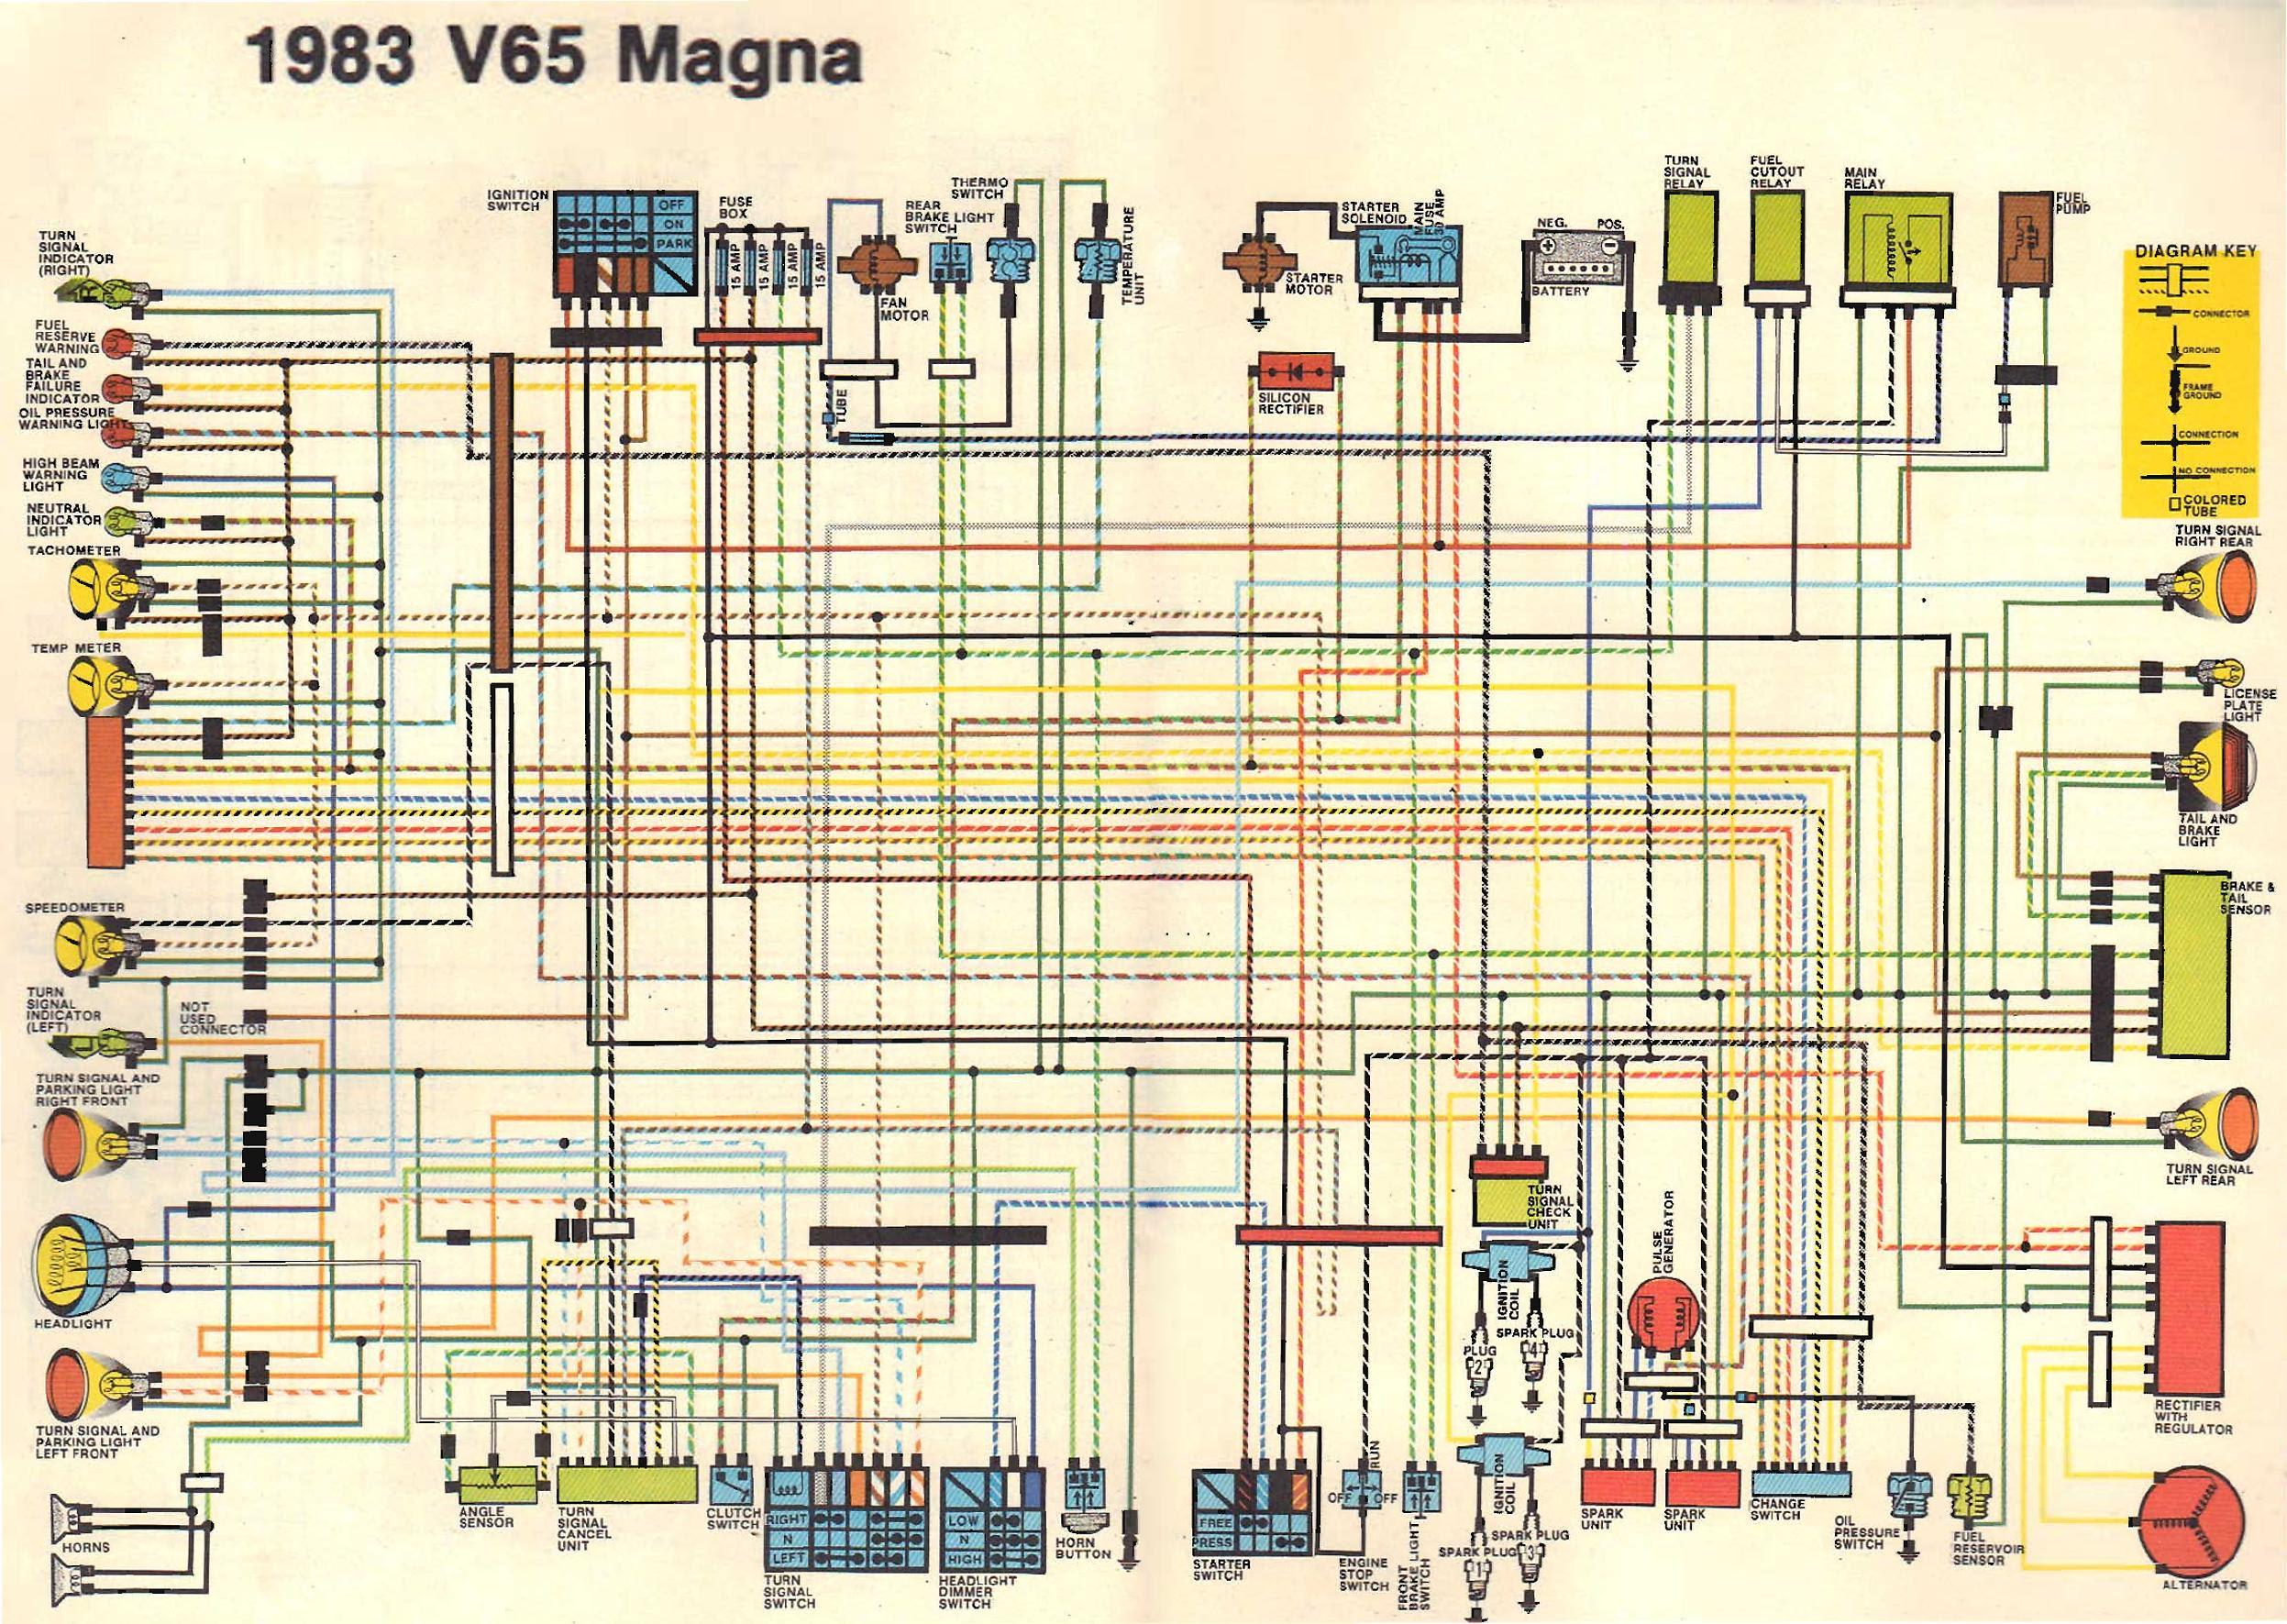 1997 Honda Magna Wiring Diagram Wiring Diagram System Grow Locate A Grow Locate A Ediliadesign It